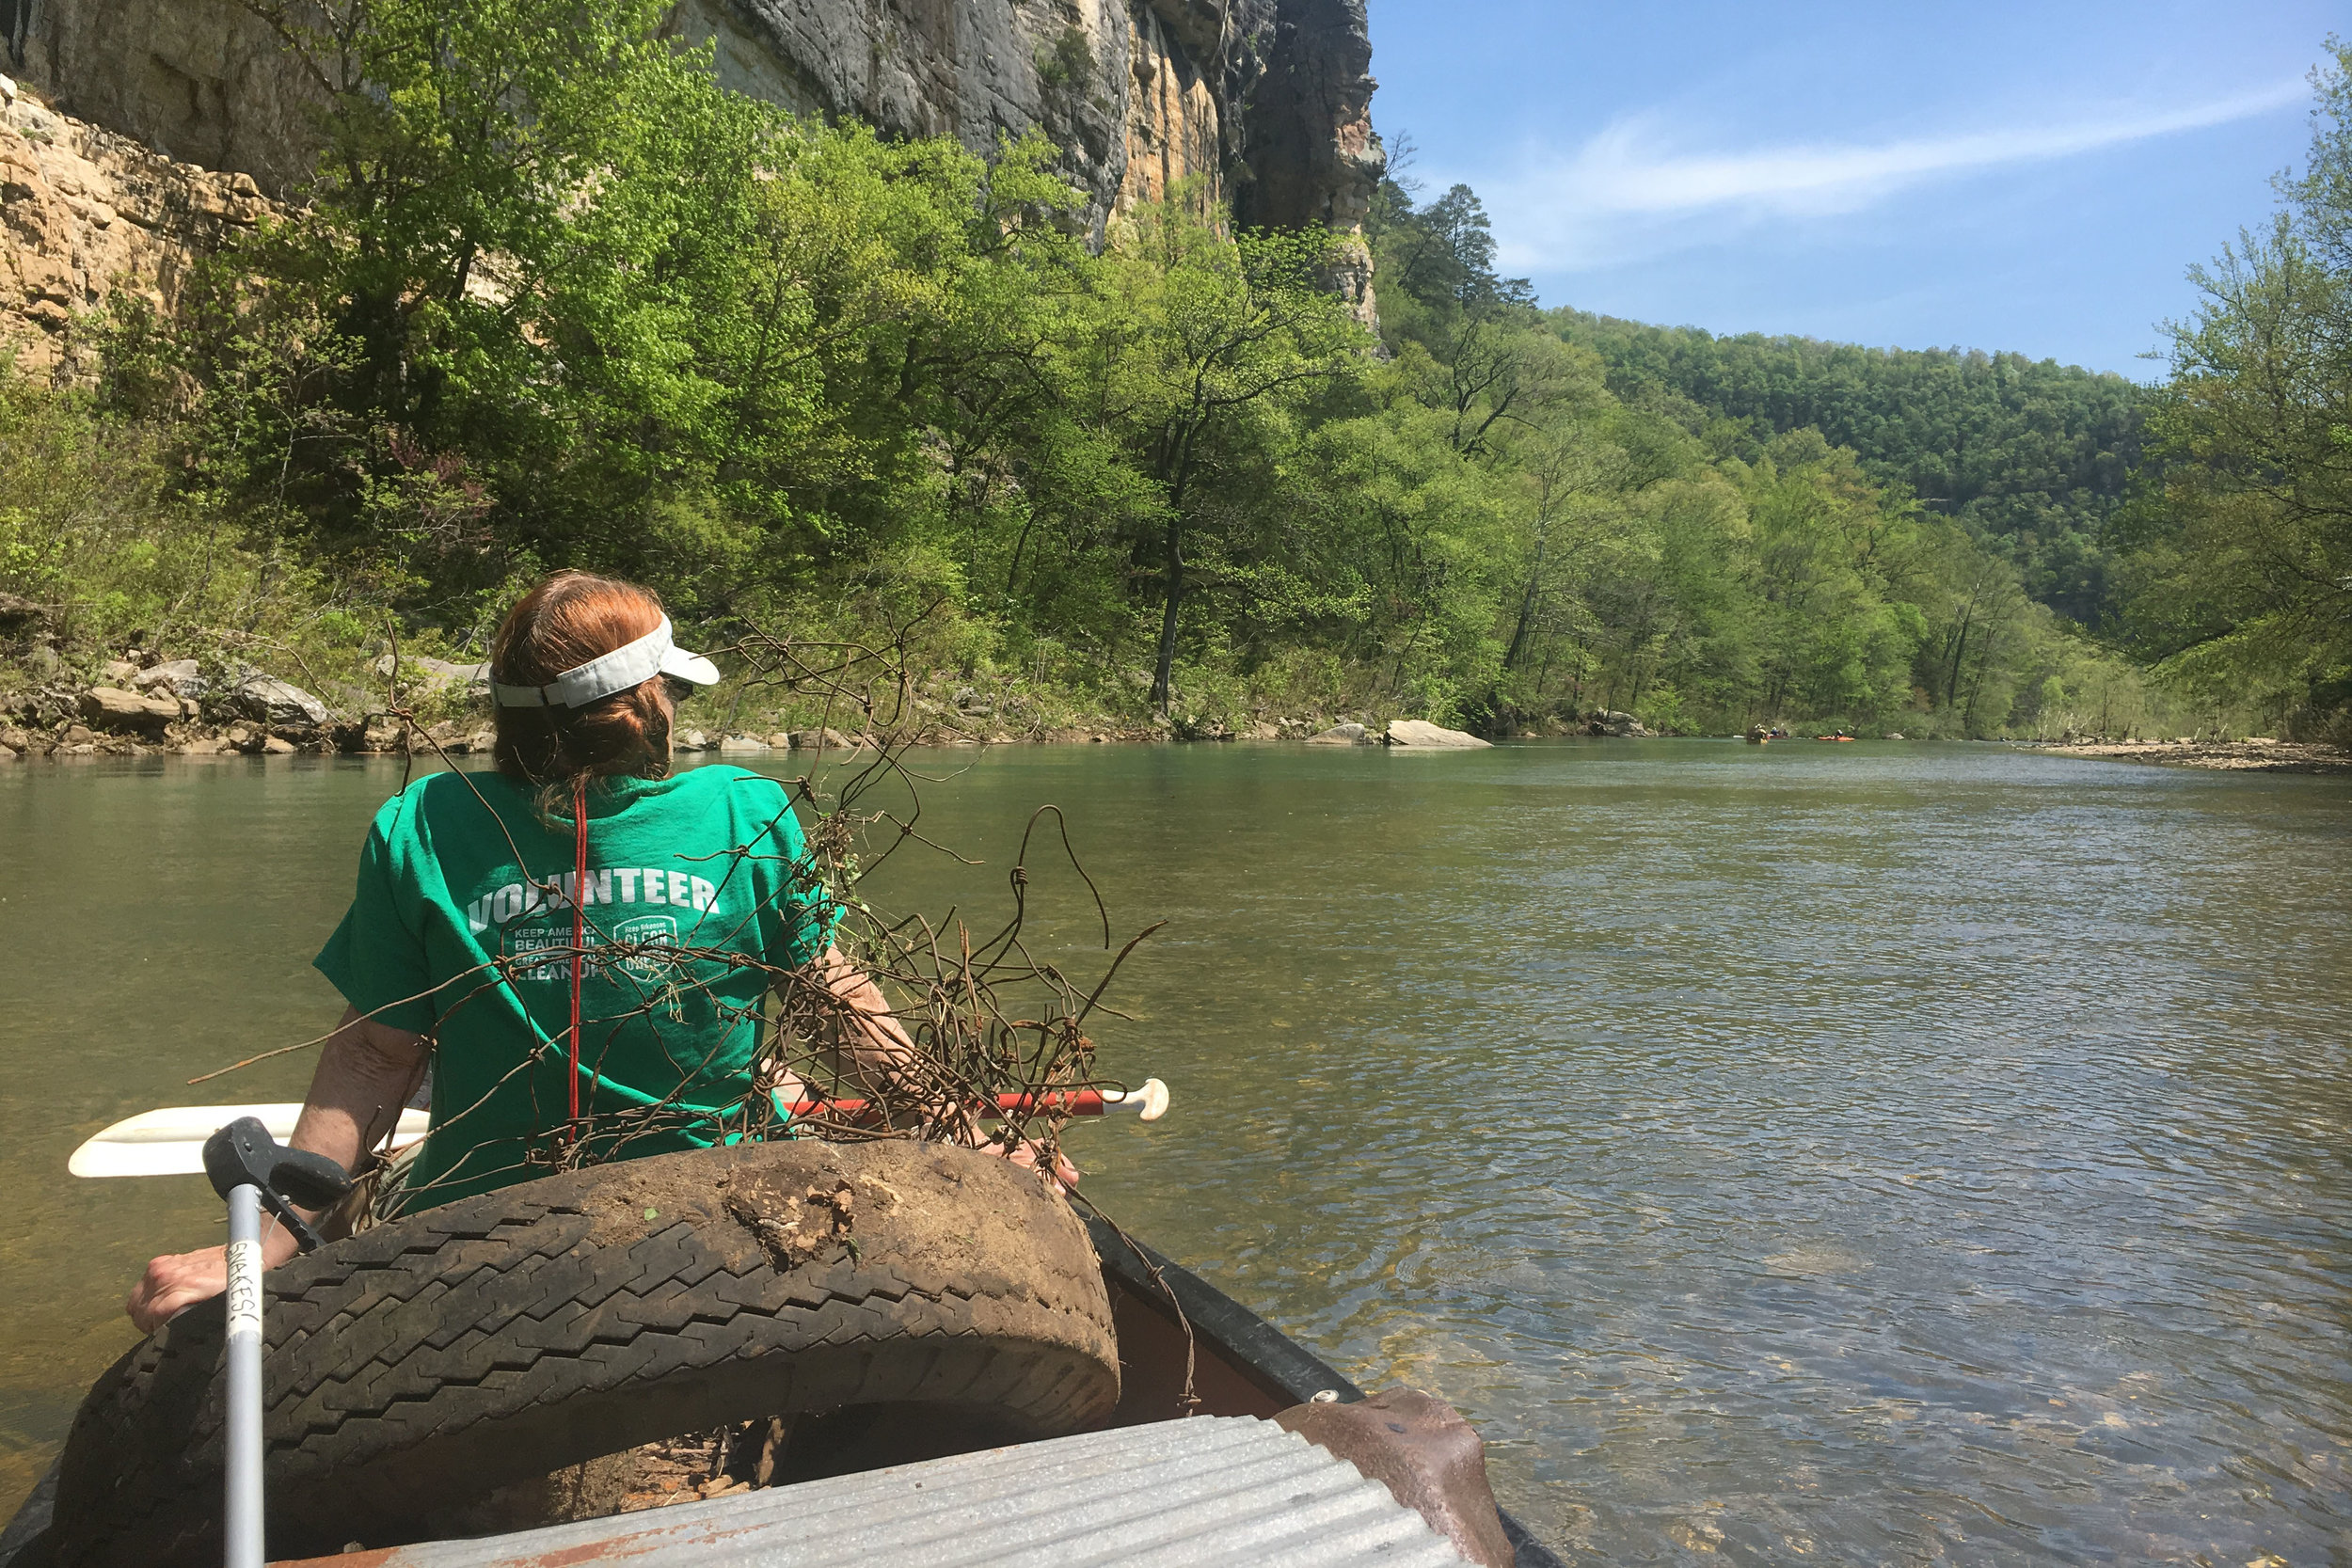 River clean up paddler cropped.jpg